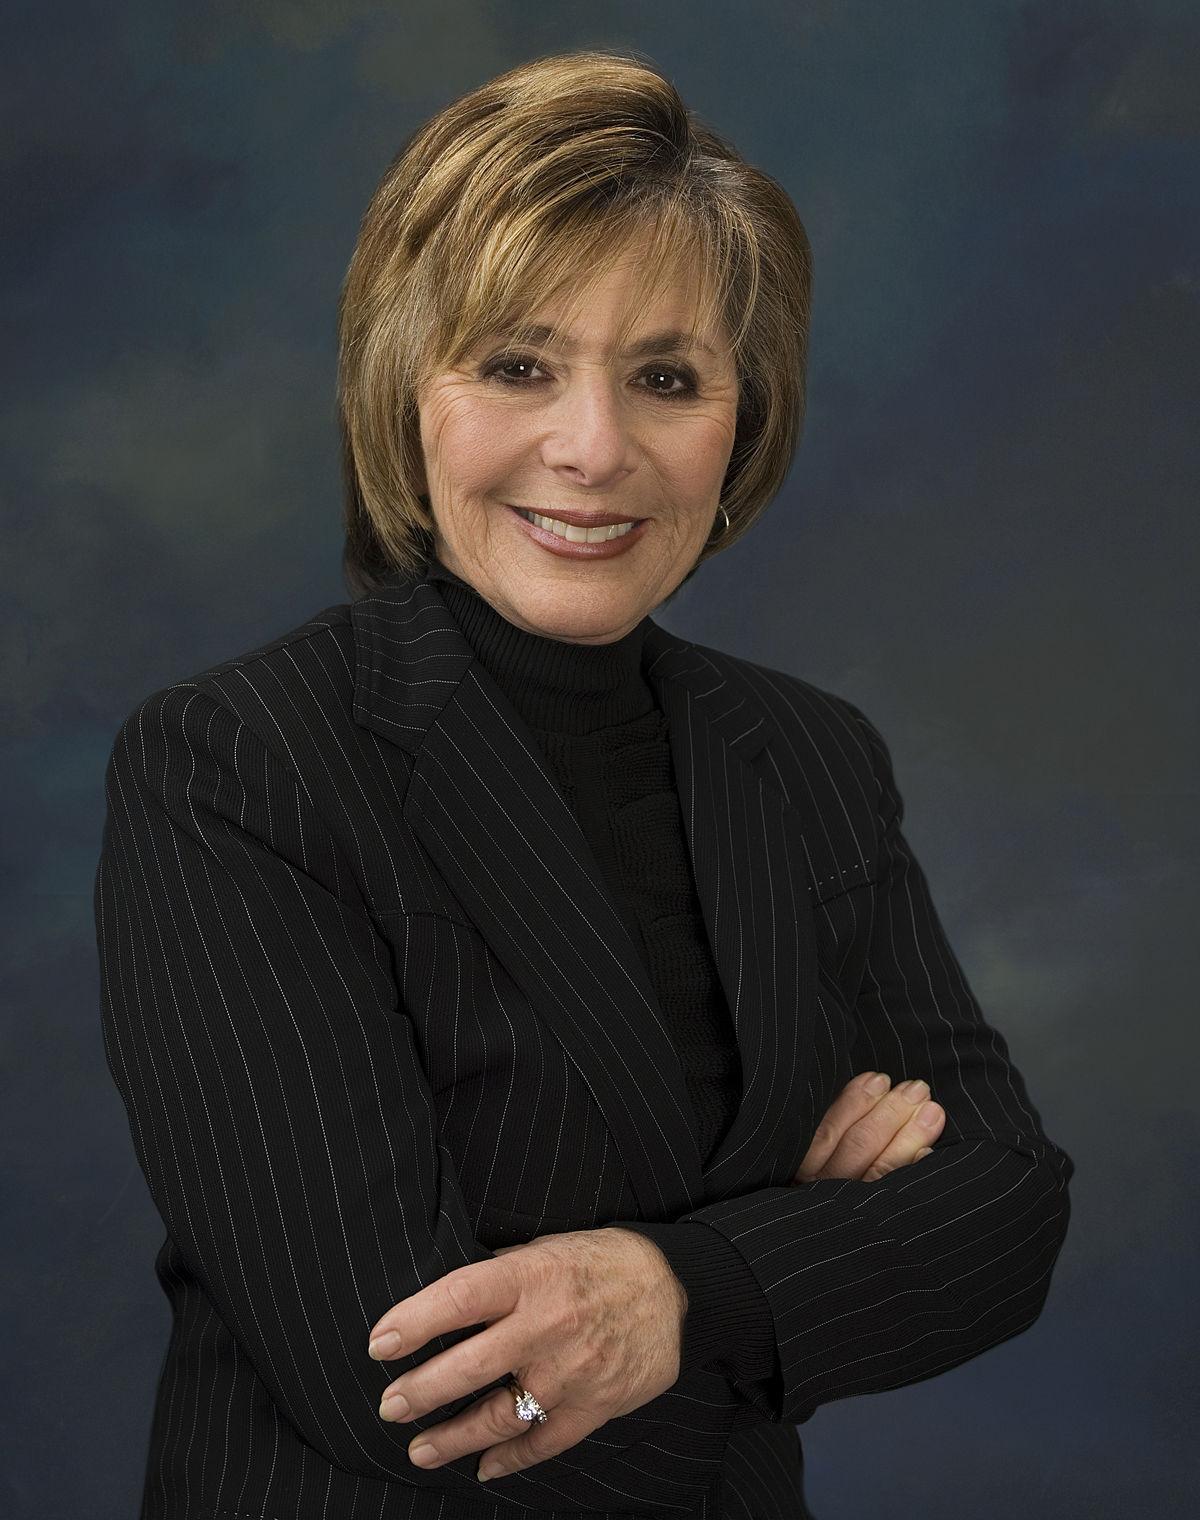 Barbara Boxer Wikipedia